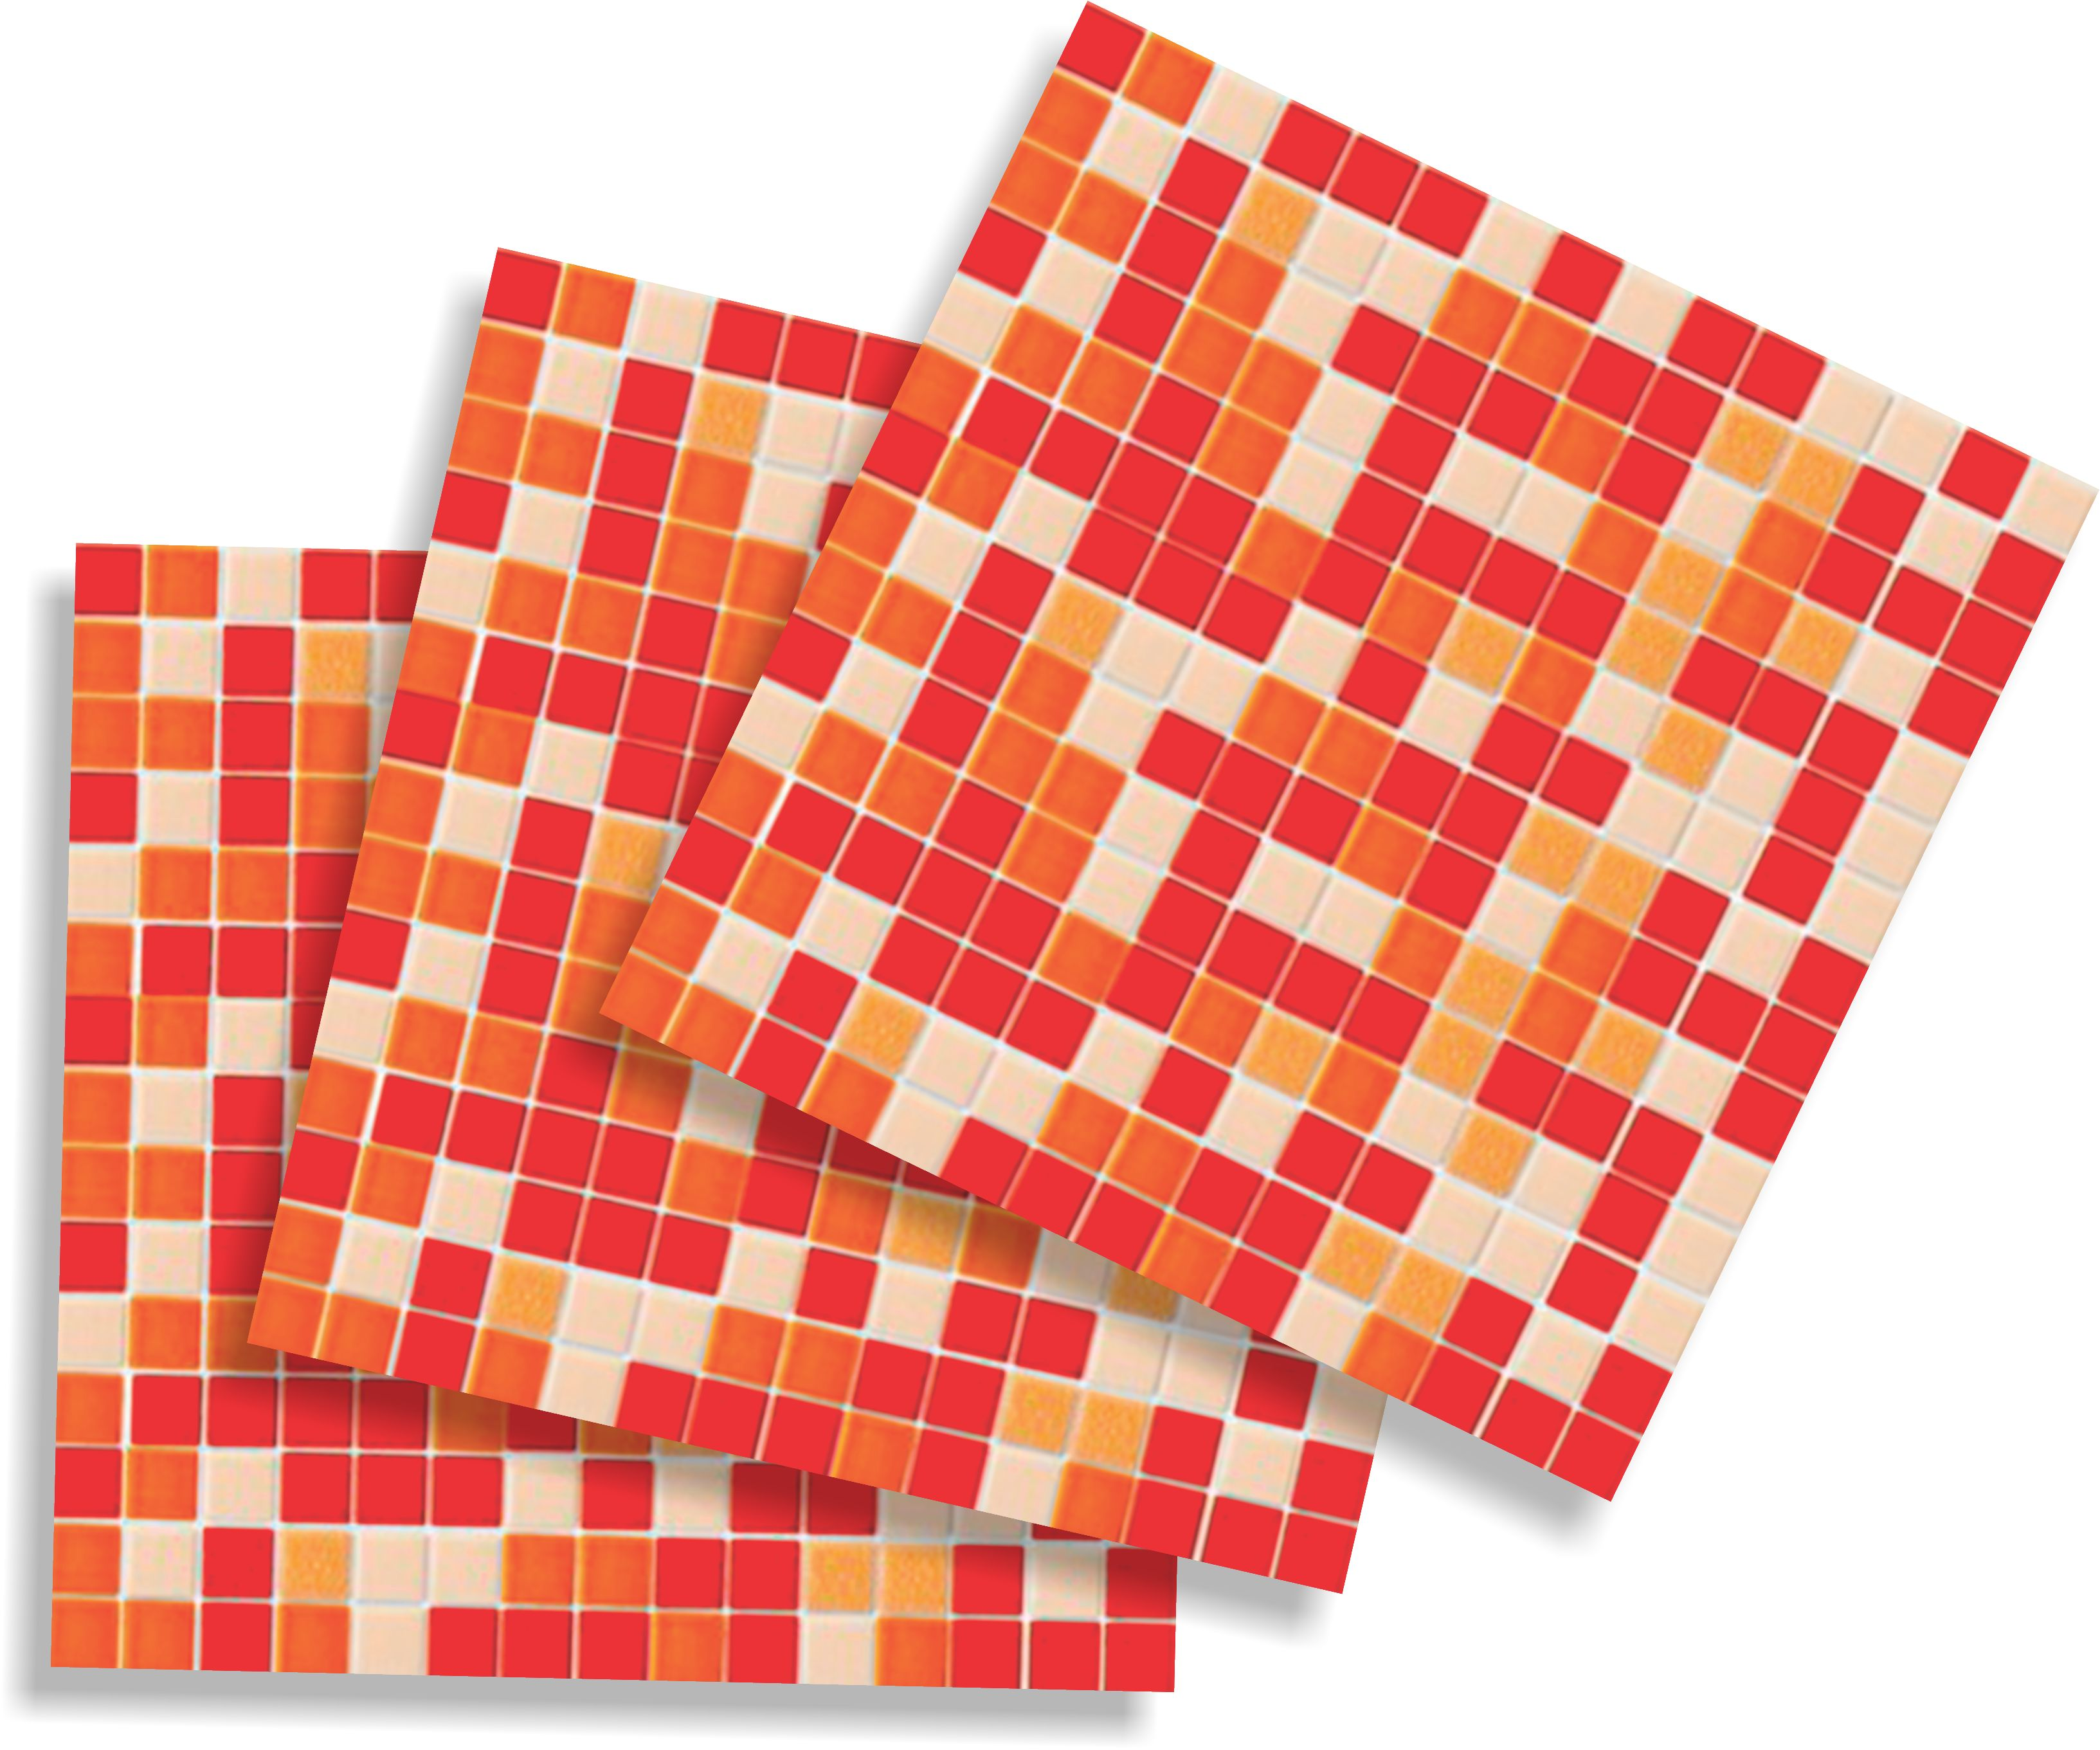 adesivos pastilha laranja frete gratis colorido adesivos pastilha  #C1730A 3266x2721 Banheiro Com Pastilhas Amarelas